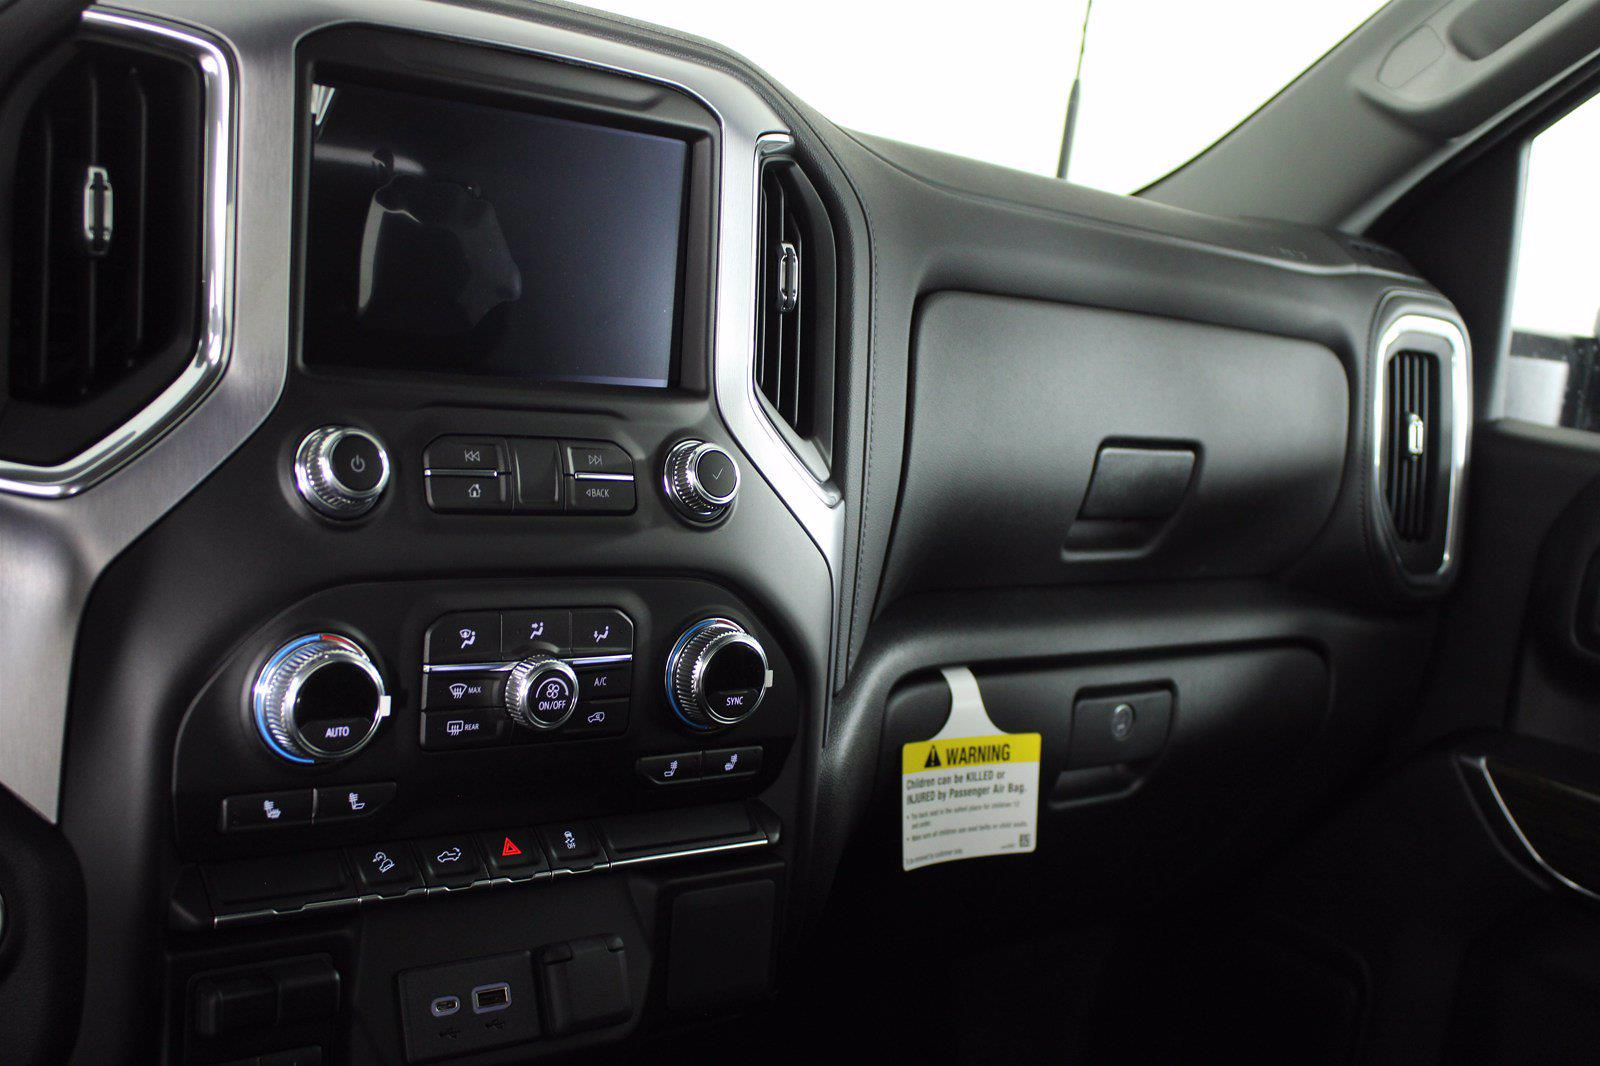 2021 GMC Sierra 2500 Regular Cab 4x4, Pickup #D411028 - photo 12